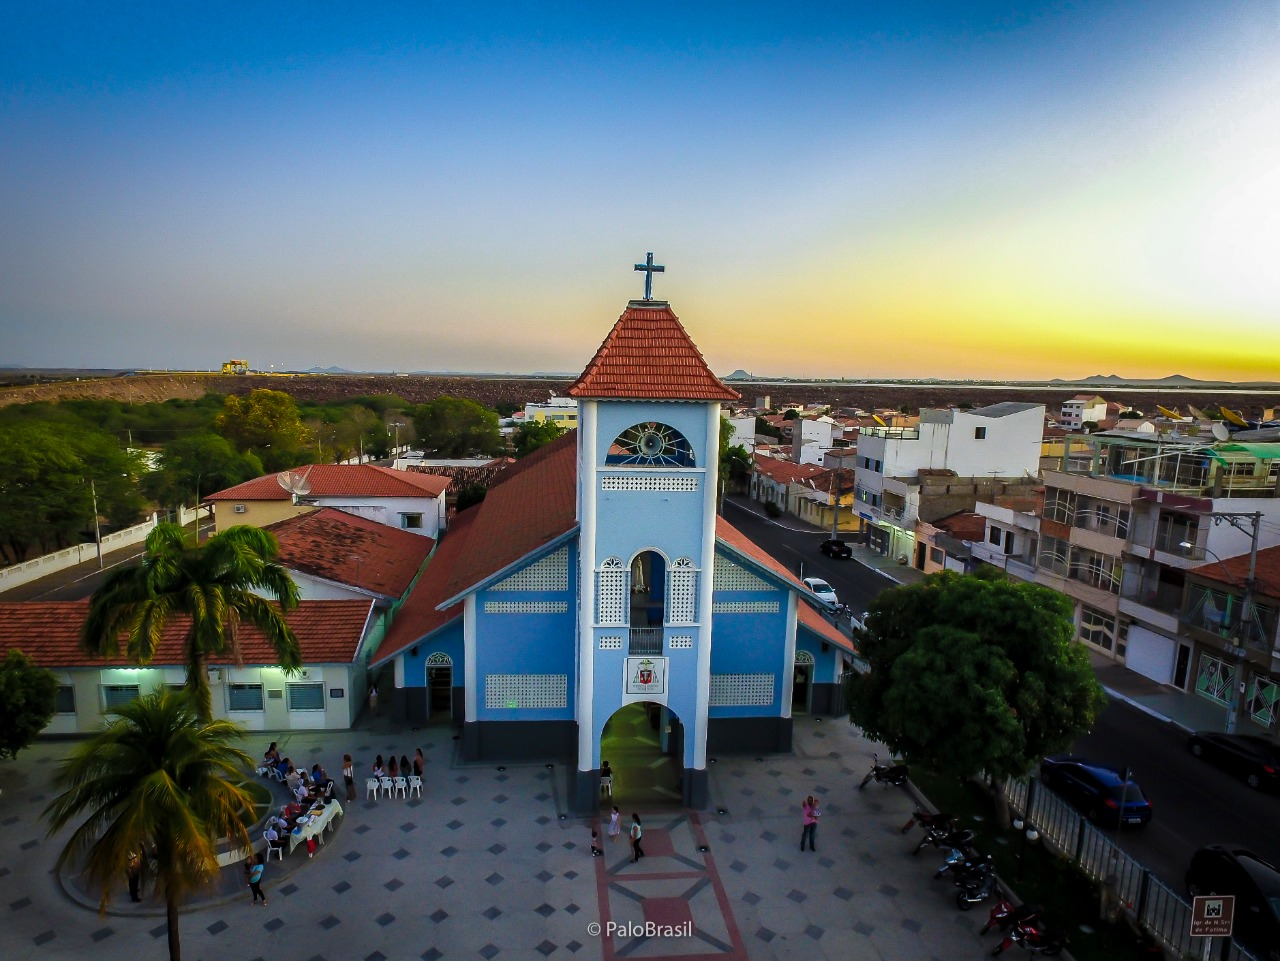 Luiz de Deus parabeniza a Diocese de Paulo Afonso por seus 49 anos